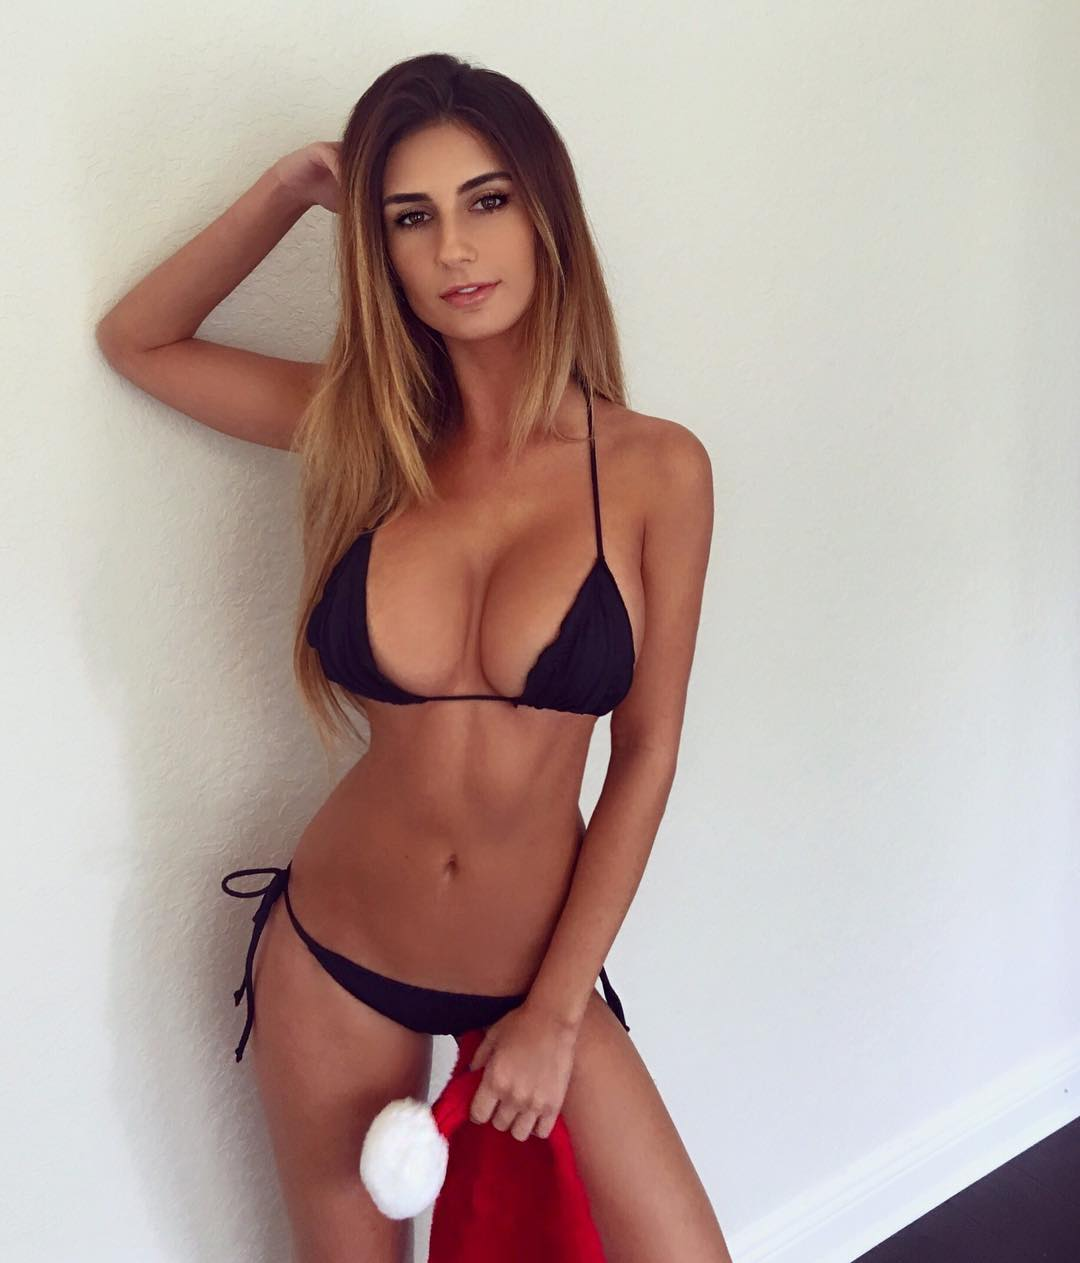 Images Bianca Ghezzi nude photos 2019